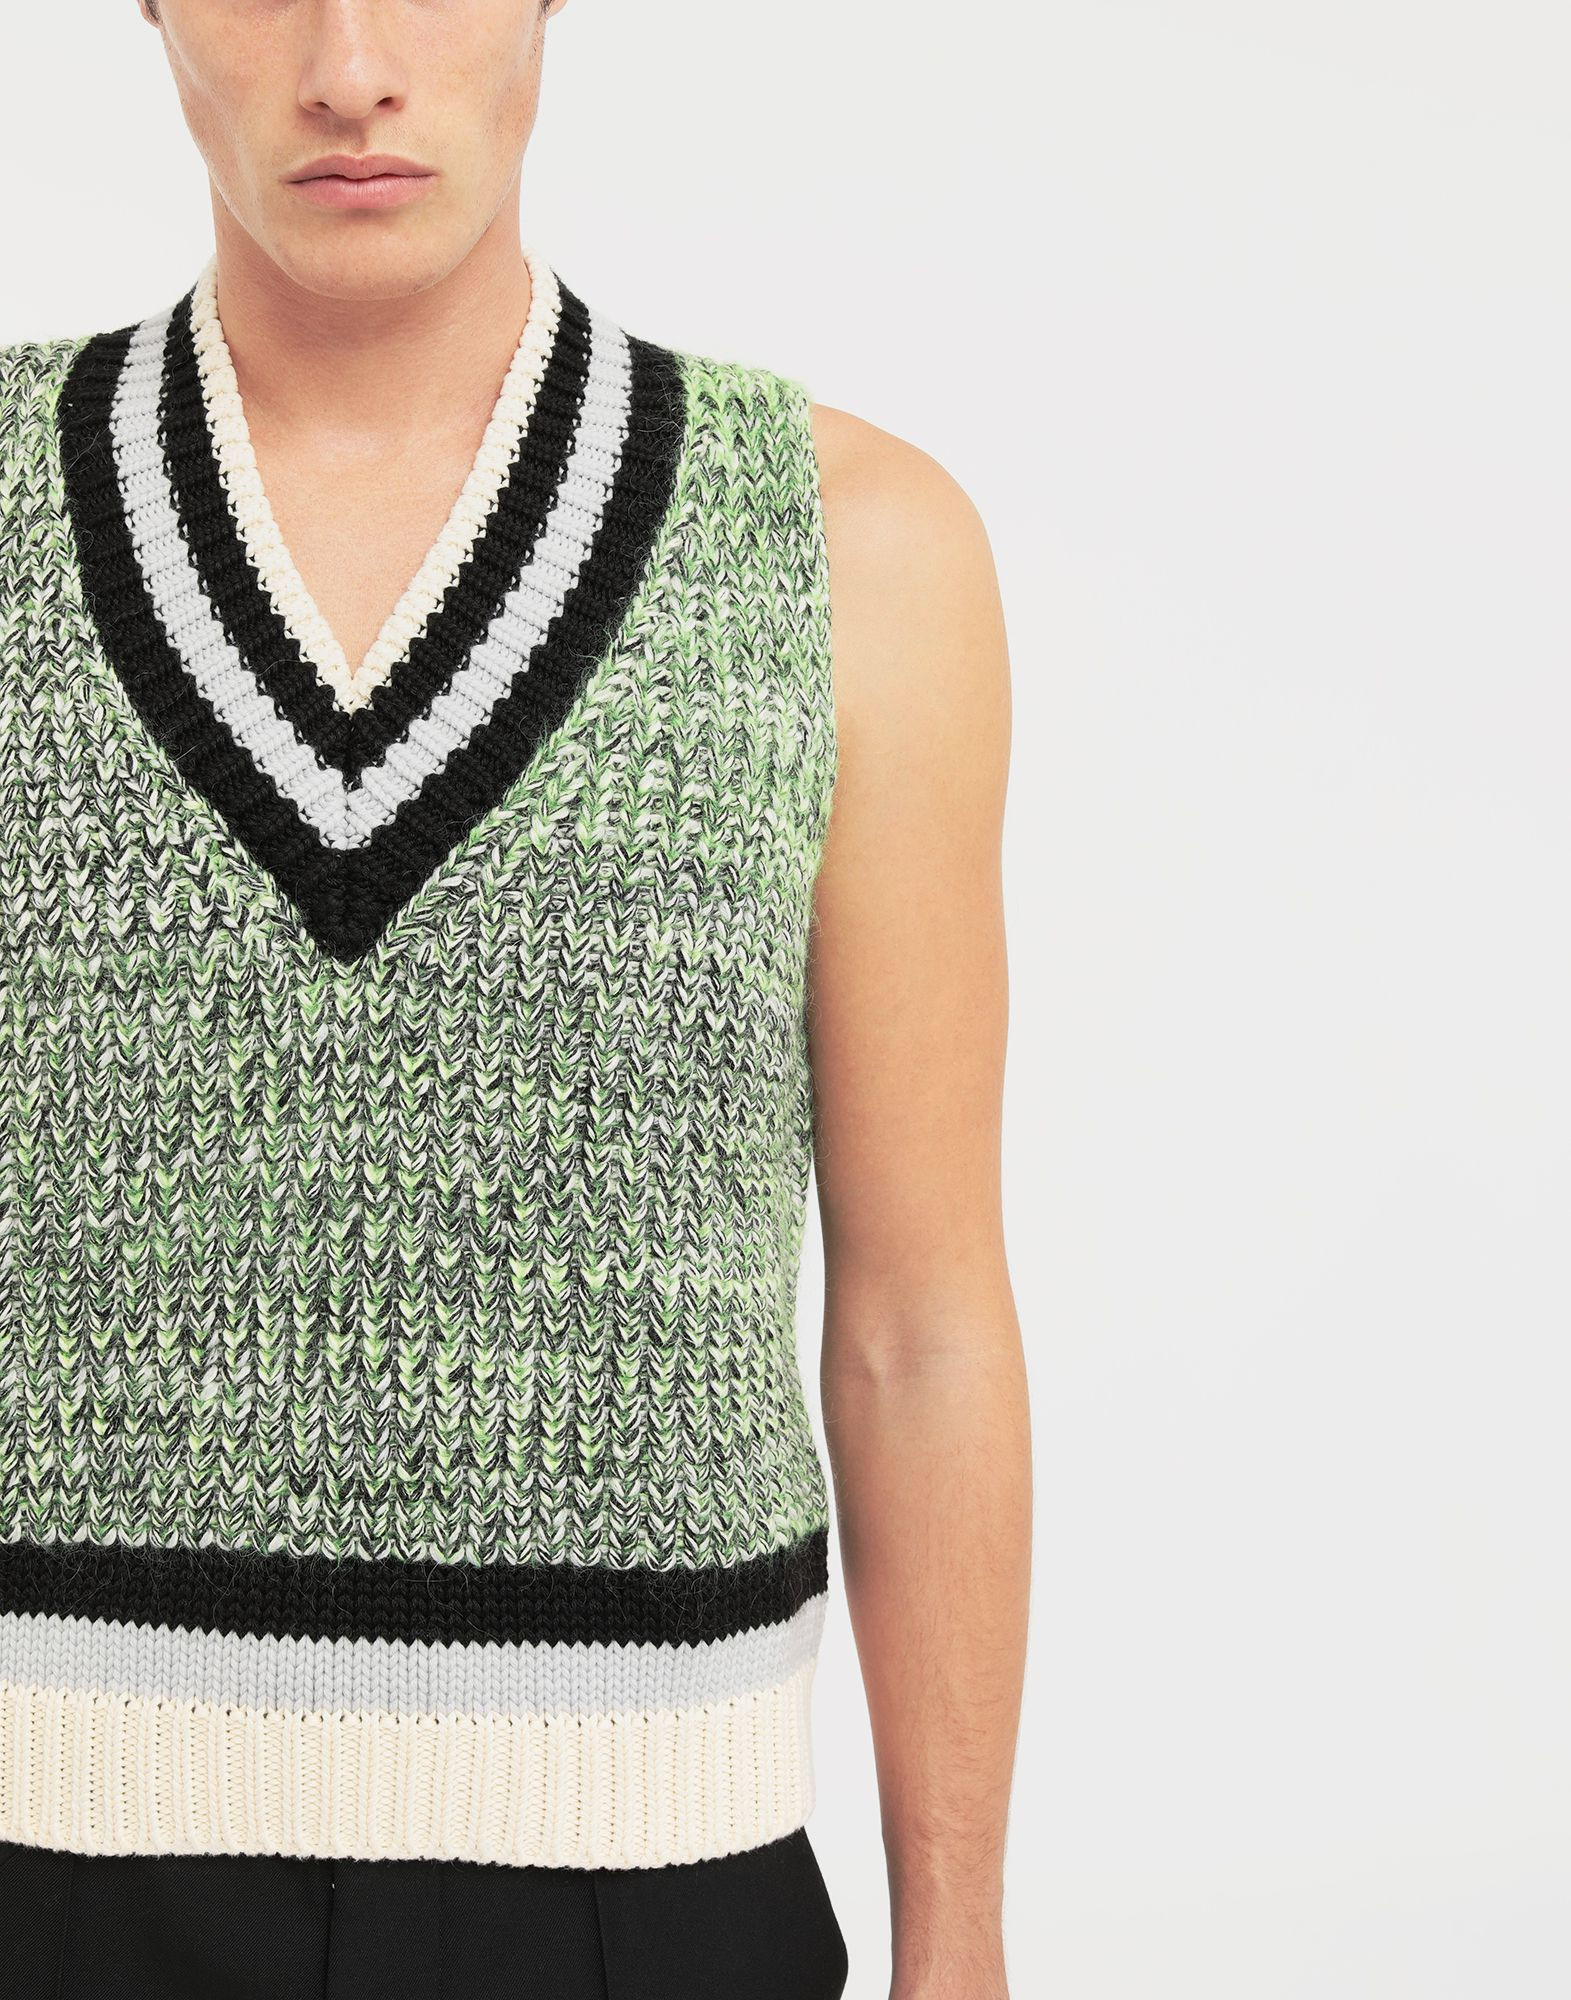 MAISON MARGIELA Sleeveless wide knit pullover V-neck sweater Man a